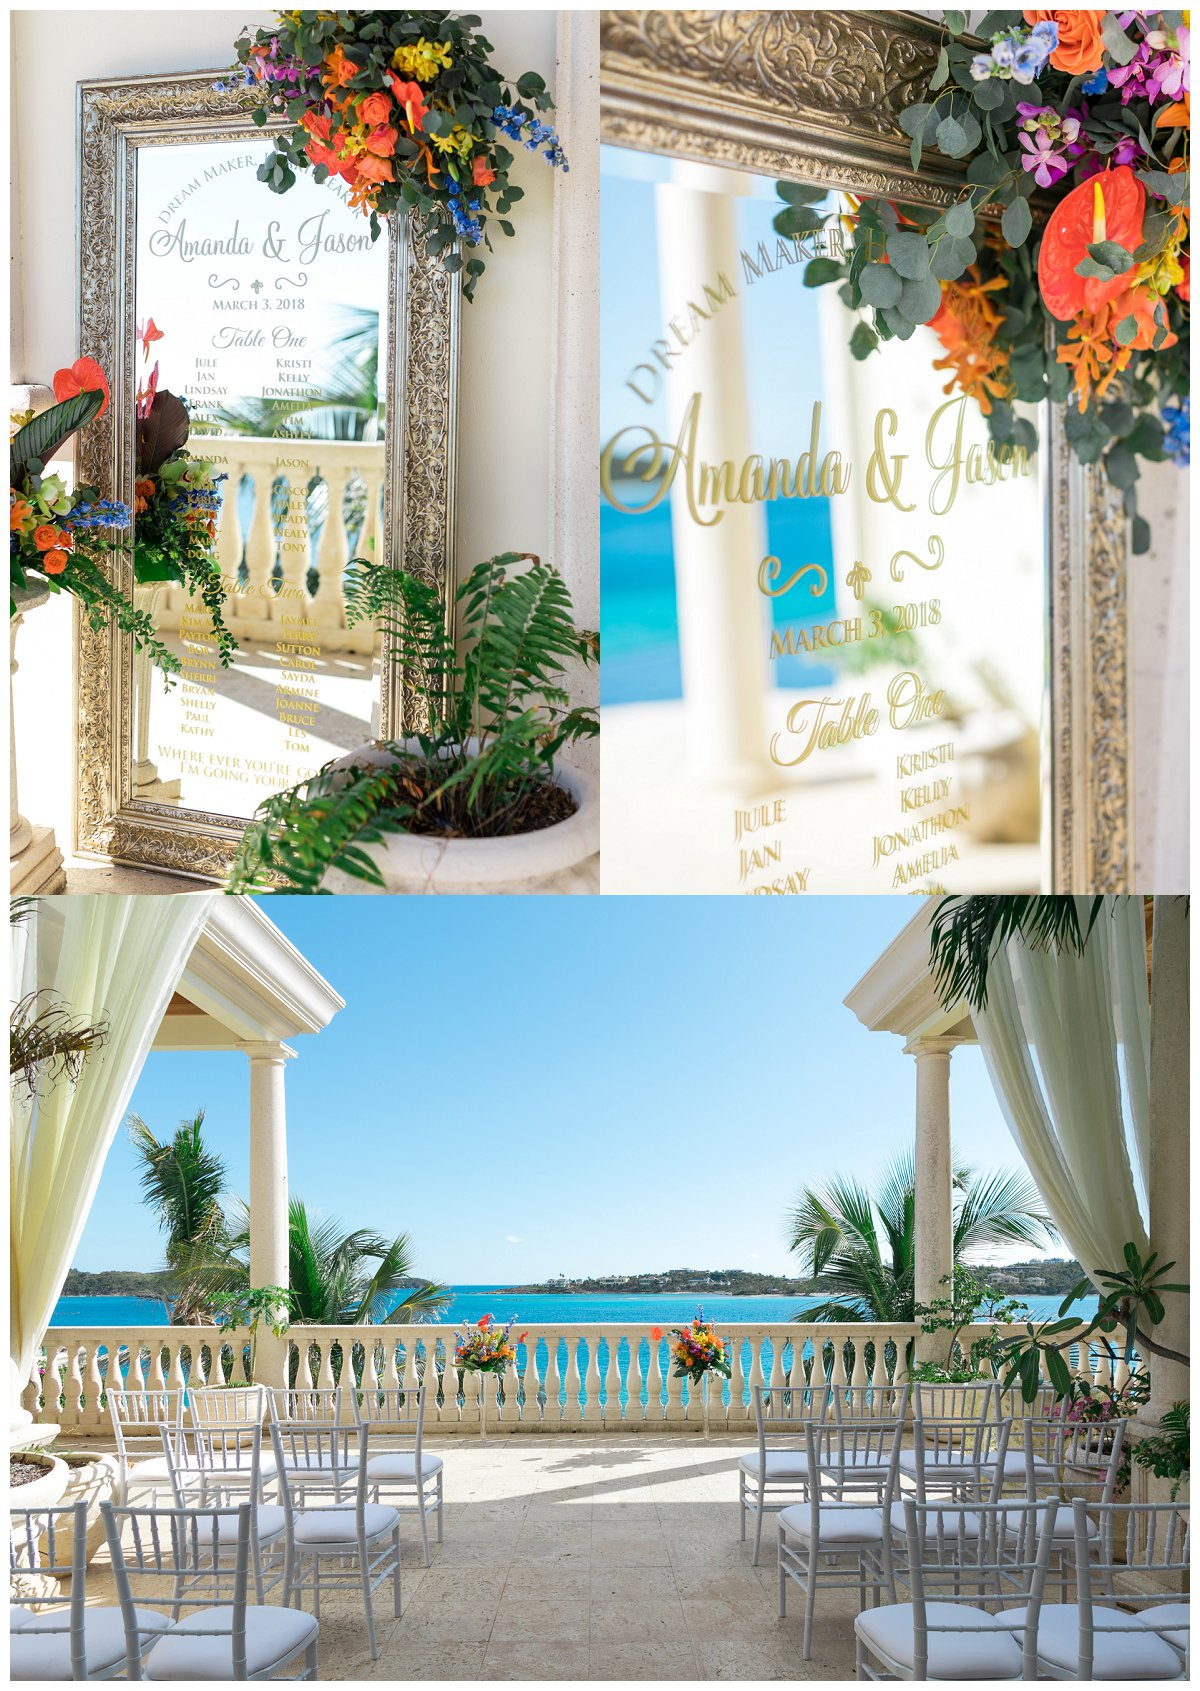 the-wedding-house-st-thomas-virgin-islands_0118.jpg